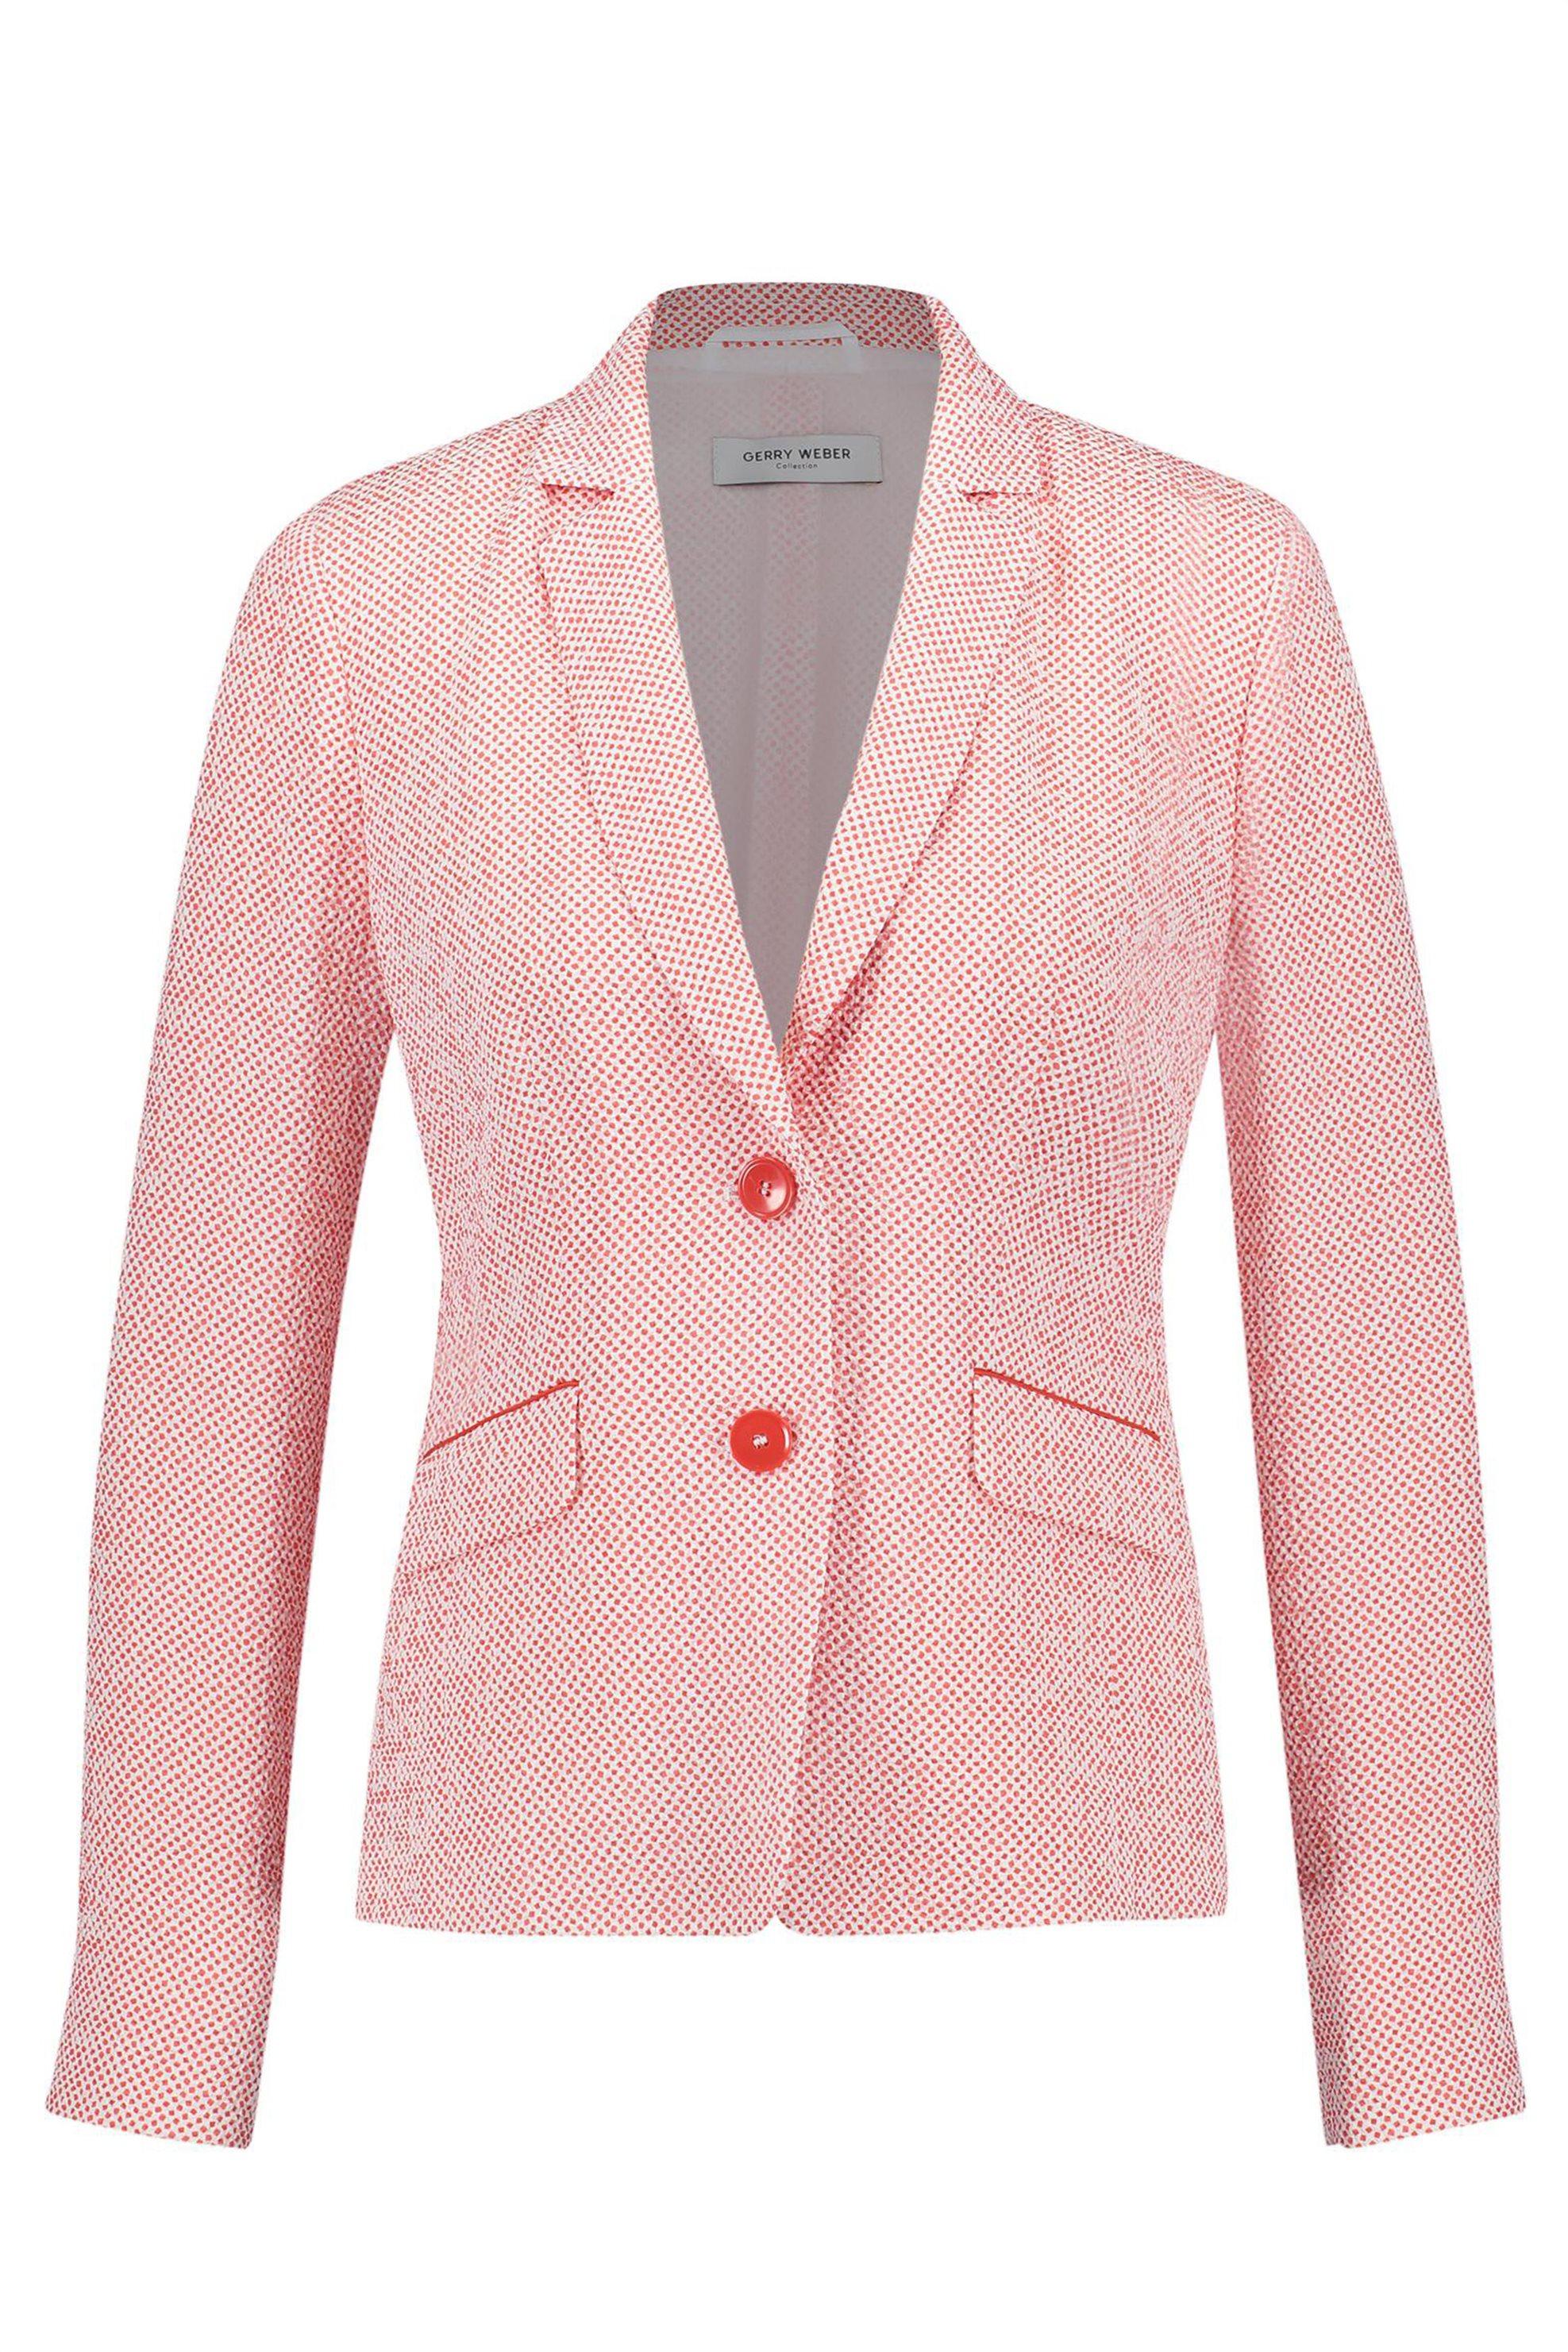 Gerry Weber γυναικείο σακάκι με μικροσχέδιο πουά - 730041-38328 - Ροζ